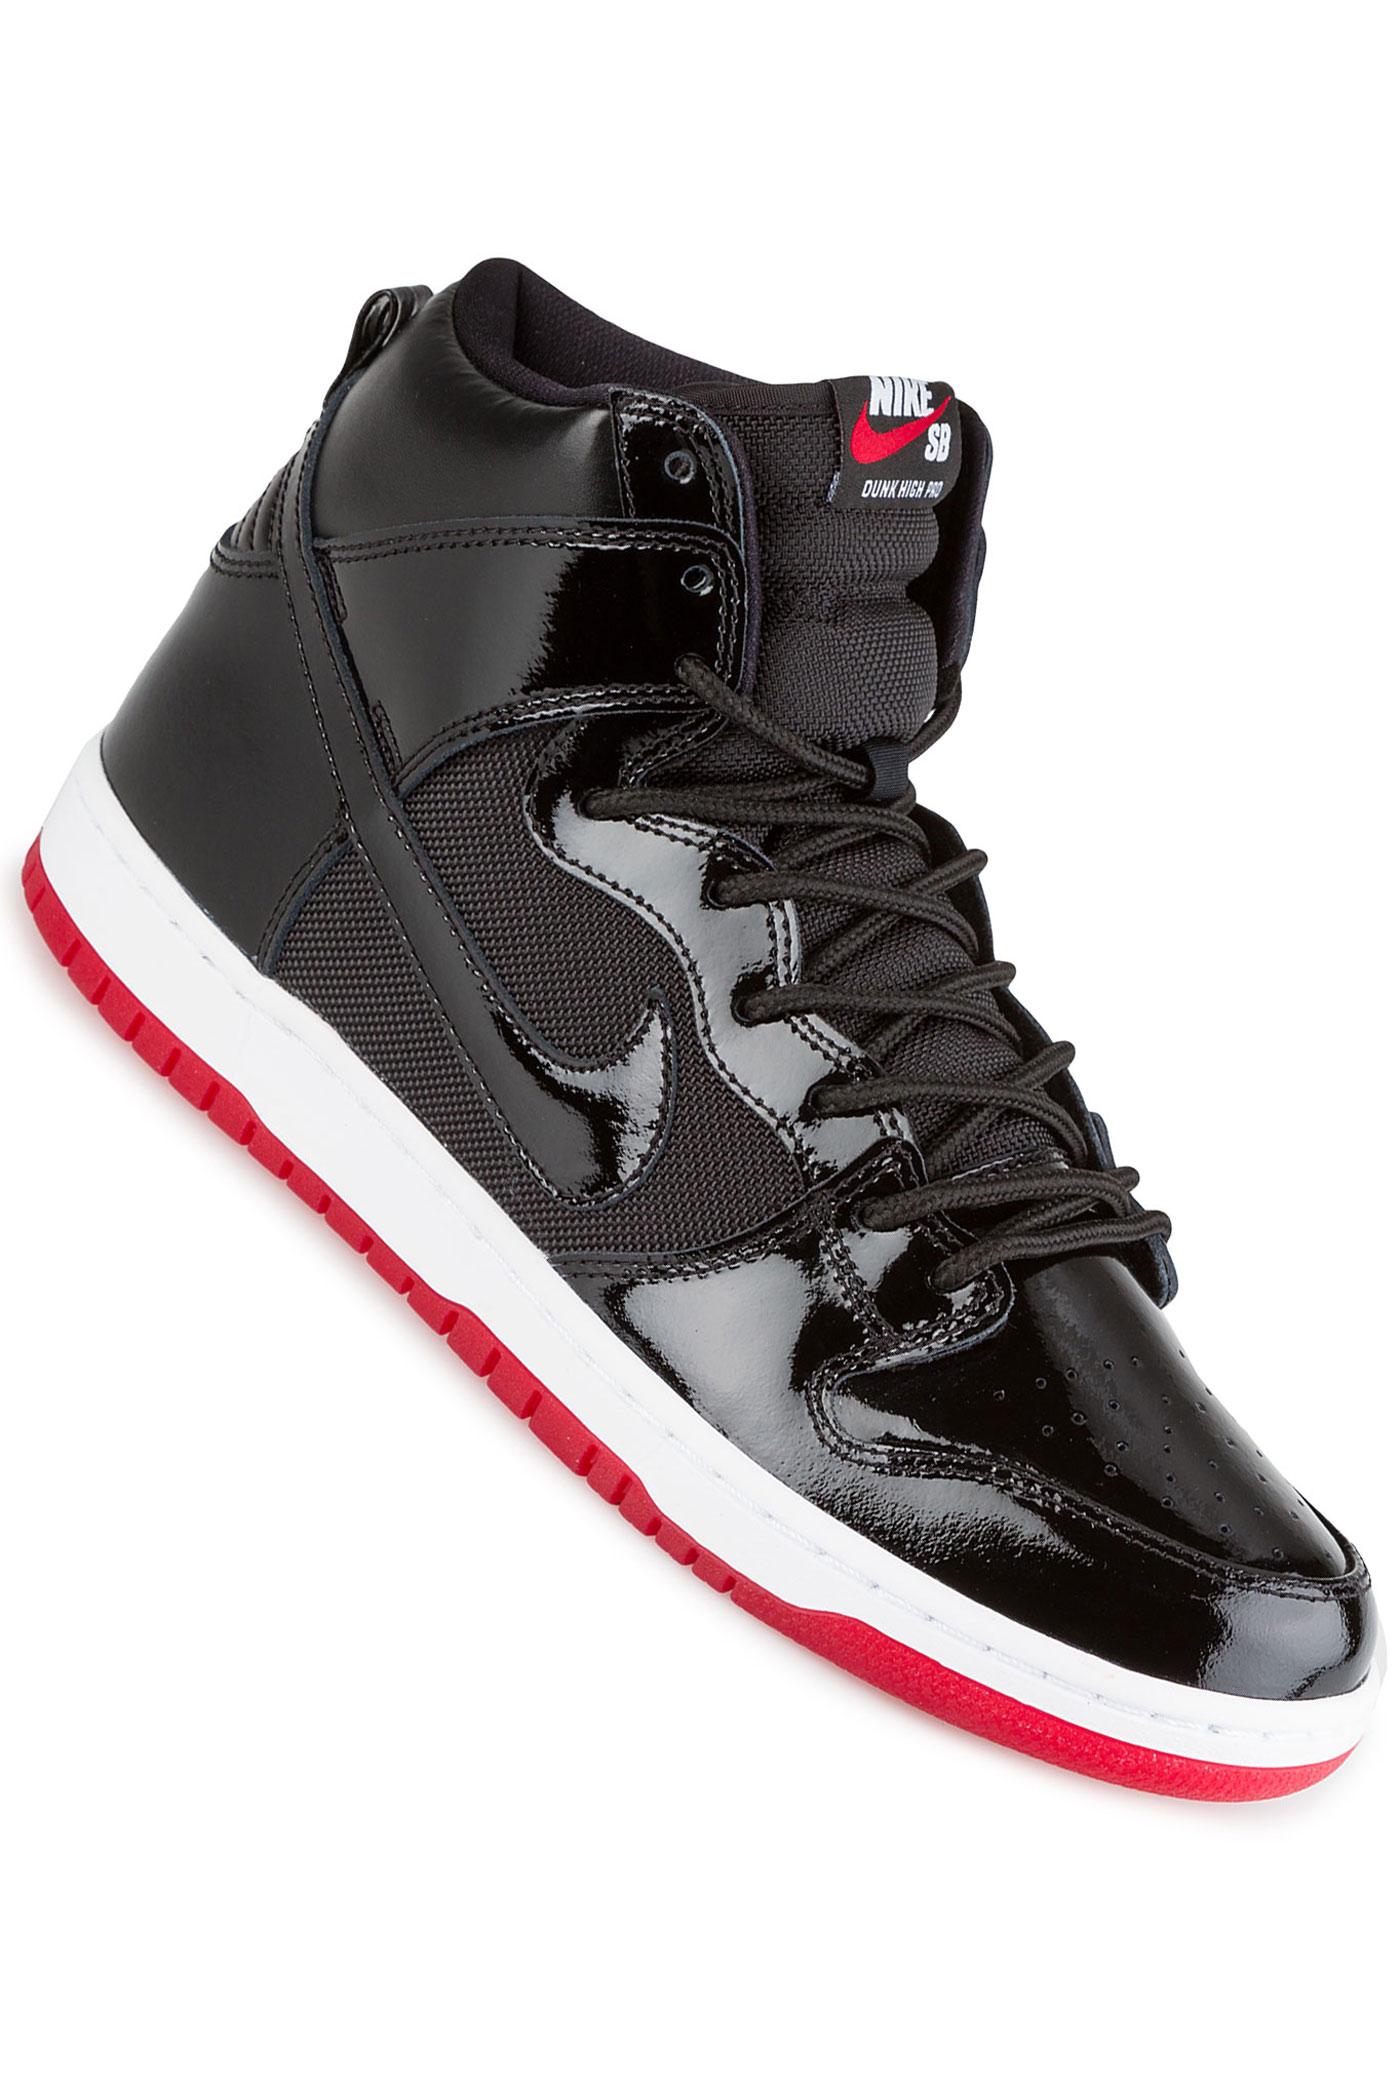 Zoom High Qs Sb Chaussureblack Black Tr Rivals Nike Dunk bfYv7Igy6